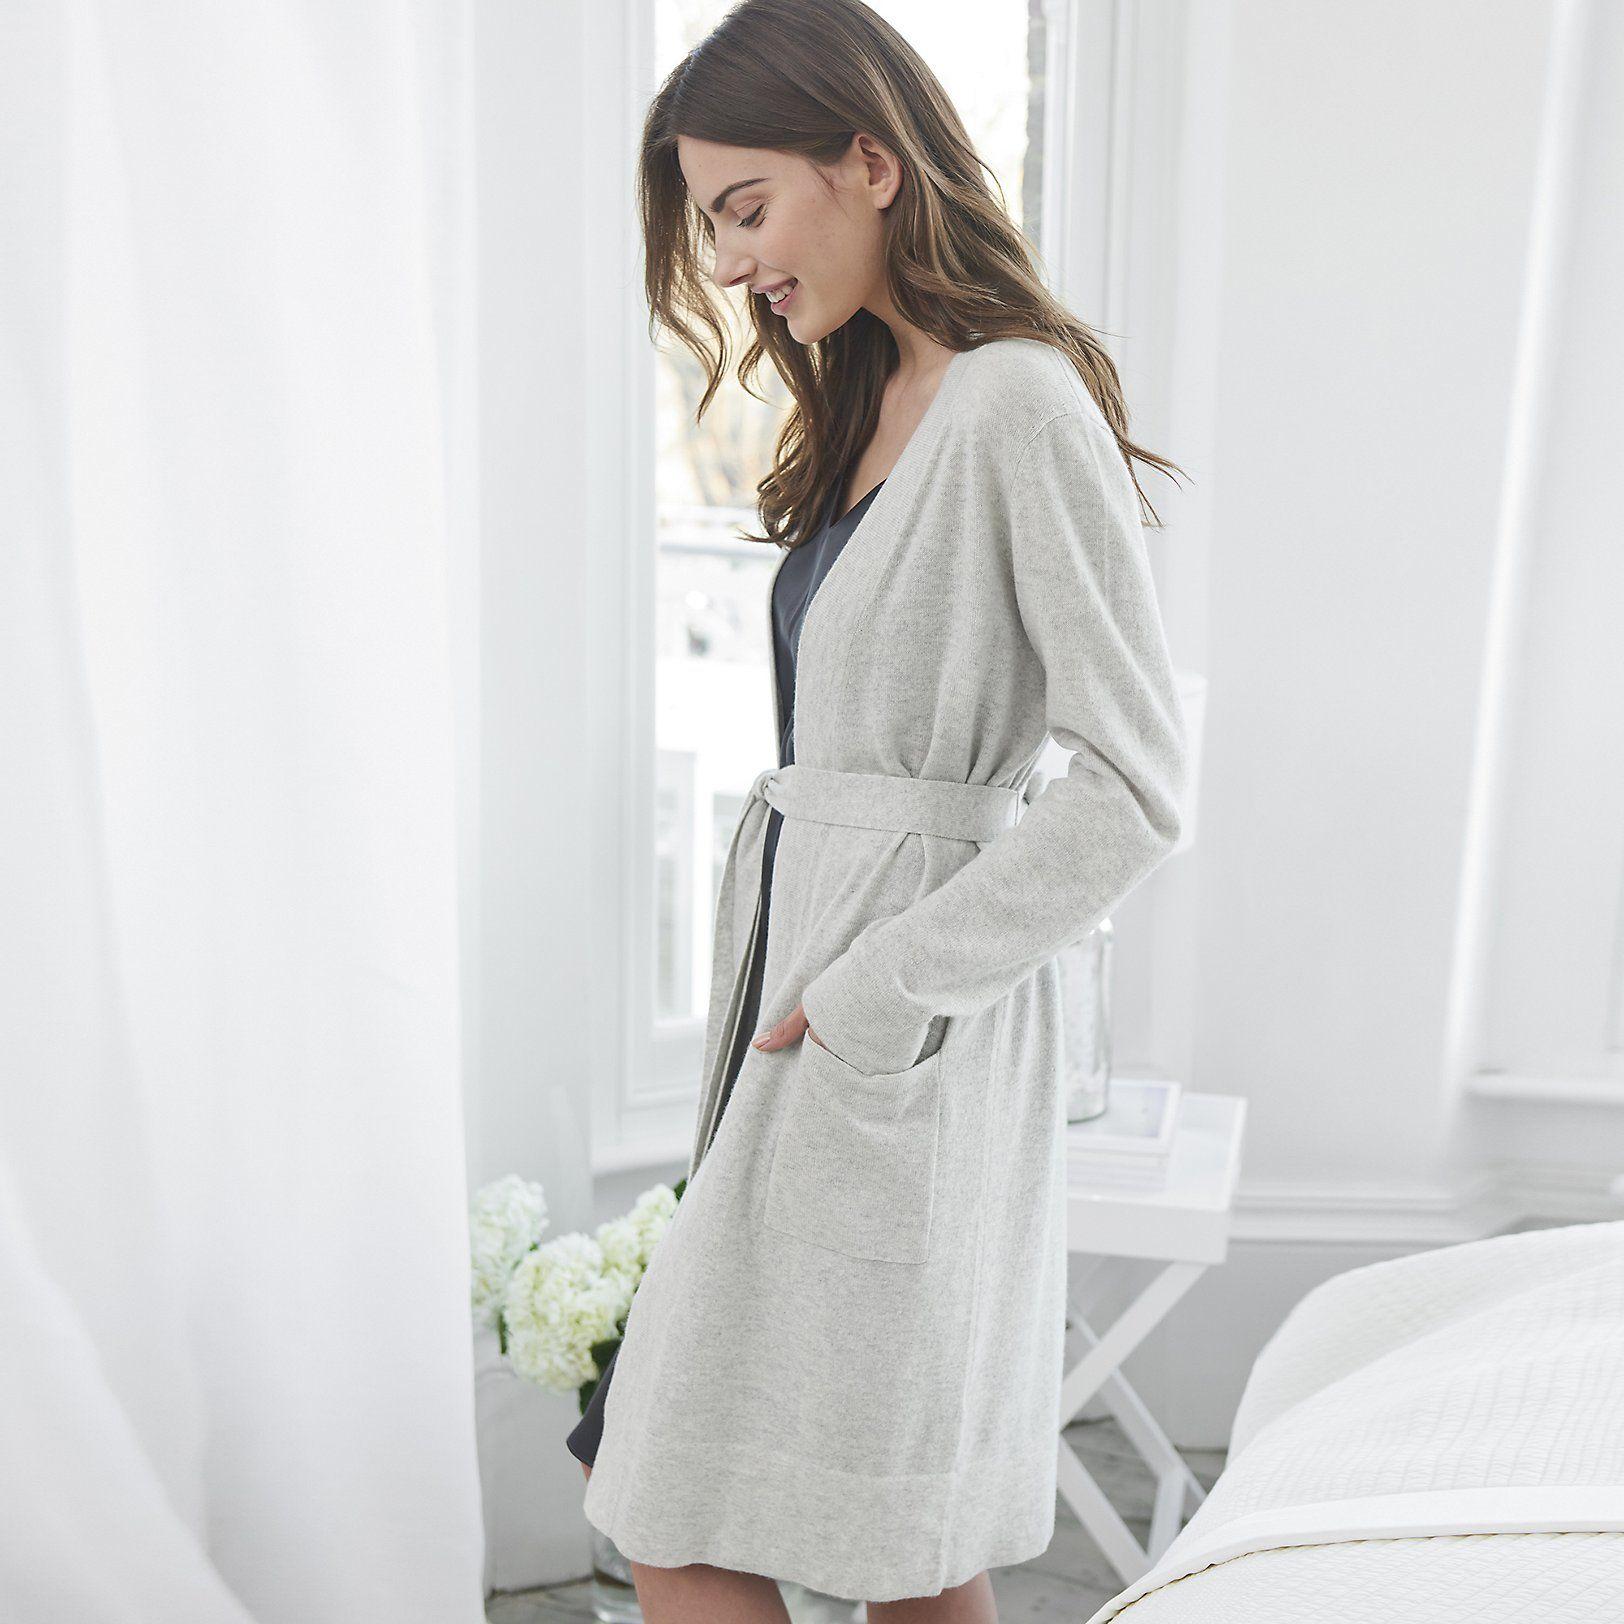 Cashmere Short Robe | Cashmere robe, White company and Cashmere